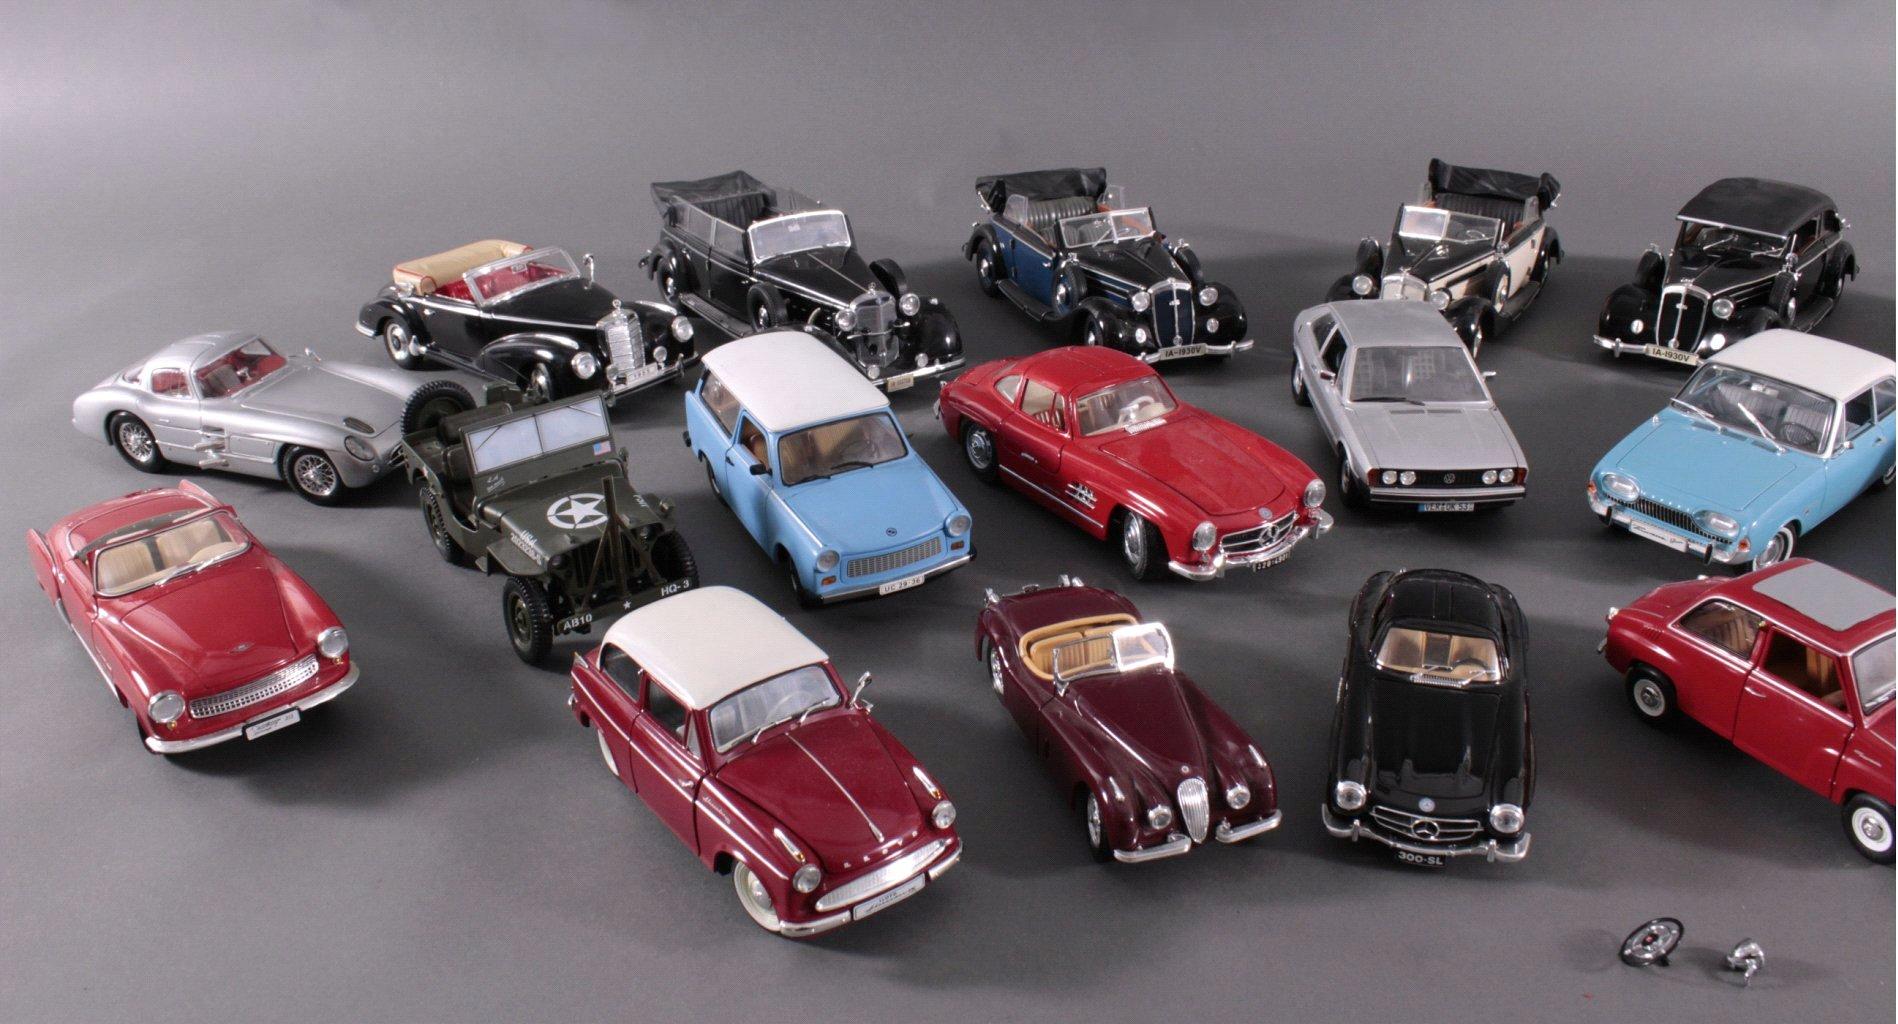 Sammlung Modellautos, 21 Stück-1